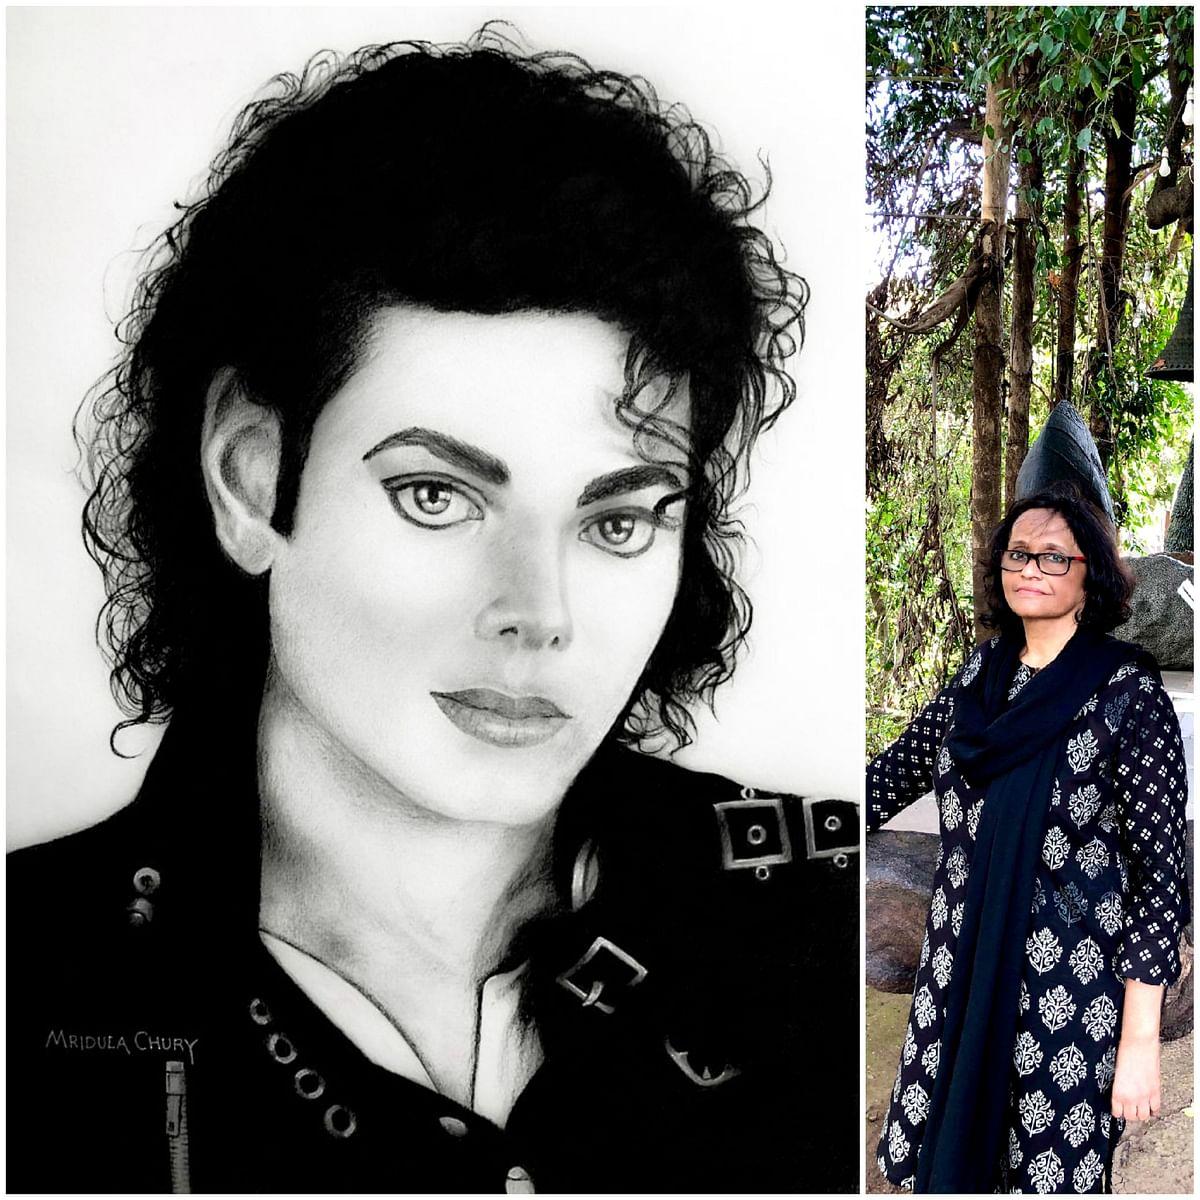 Mridula Chury's charcoal tribute to King of Pop Michael Jackson on his birth anniversary